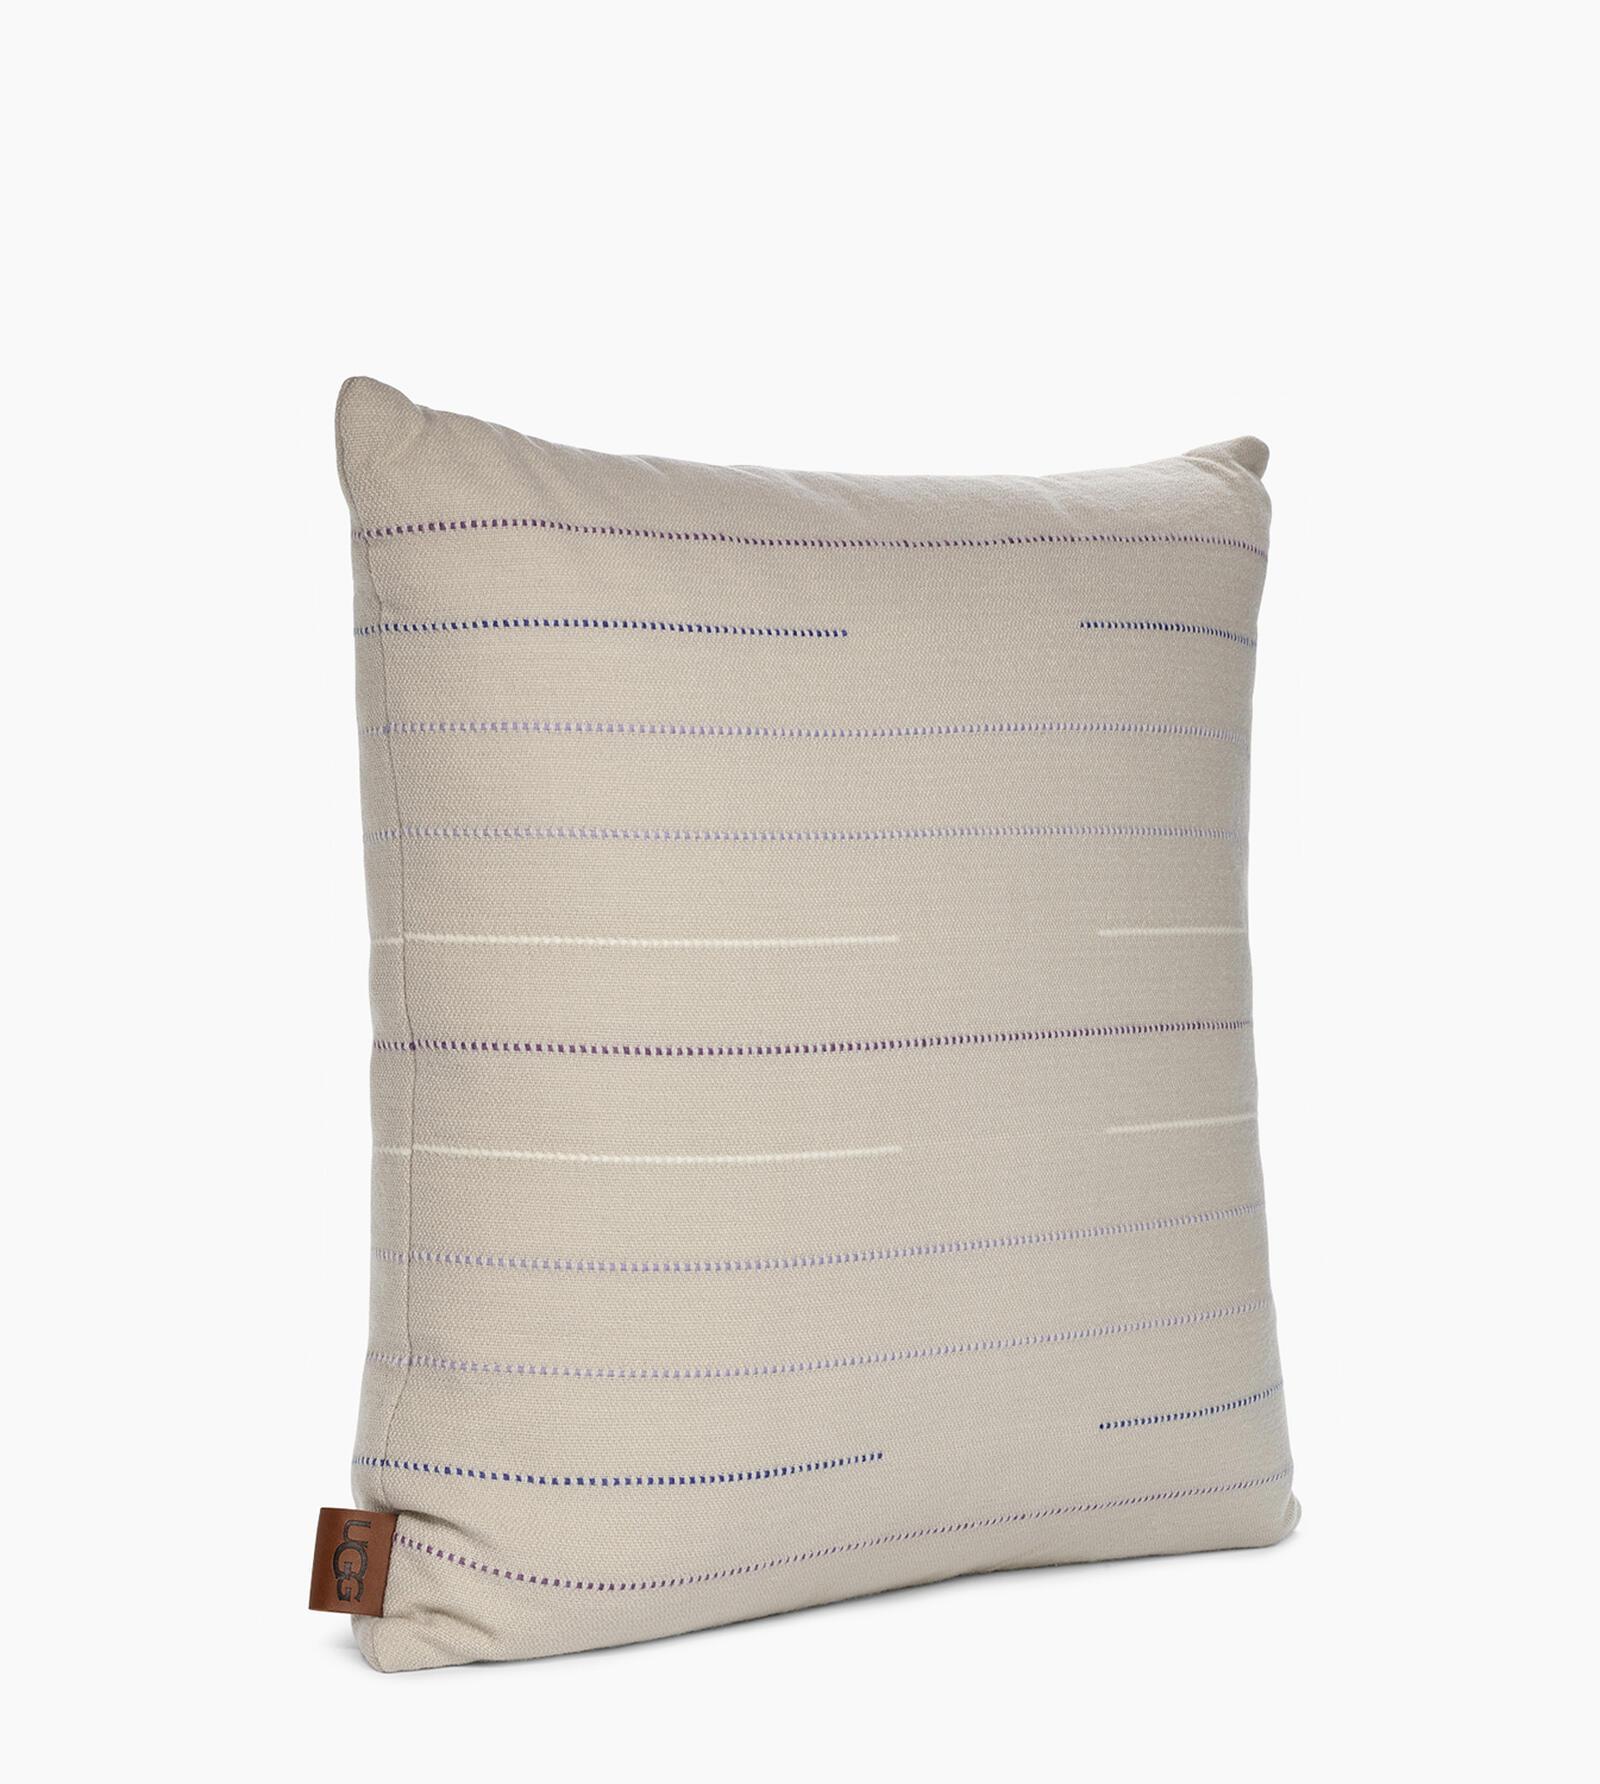 Emory Pillow